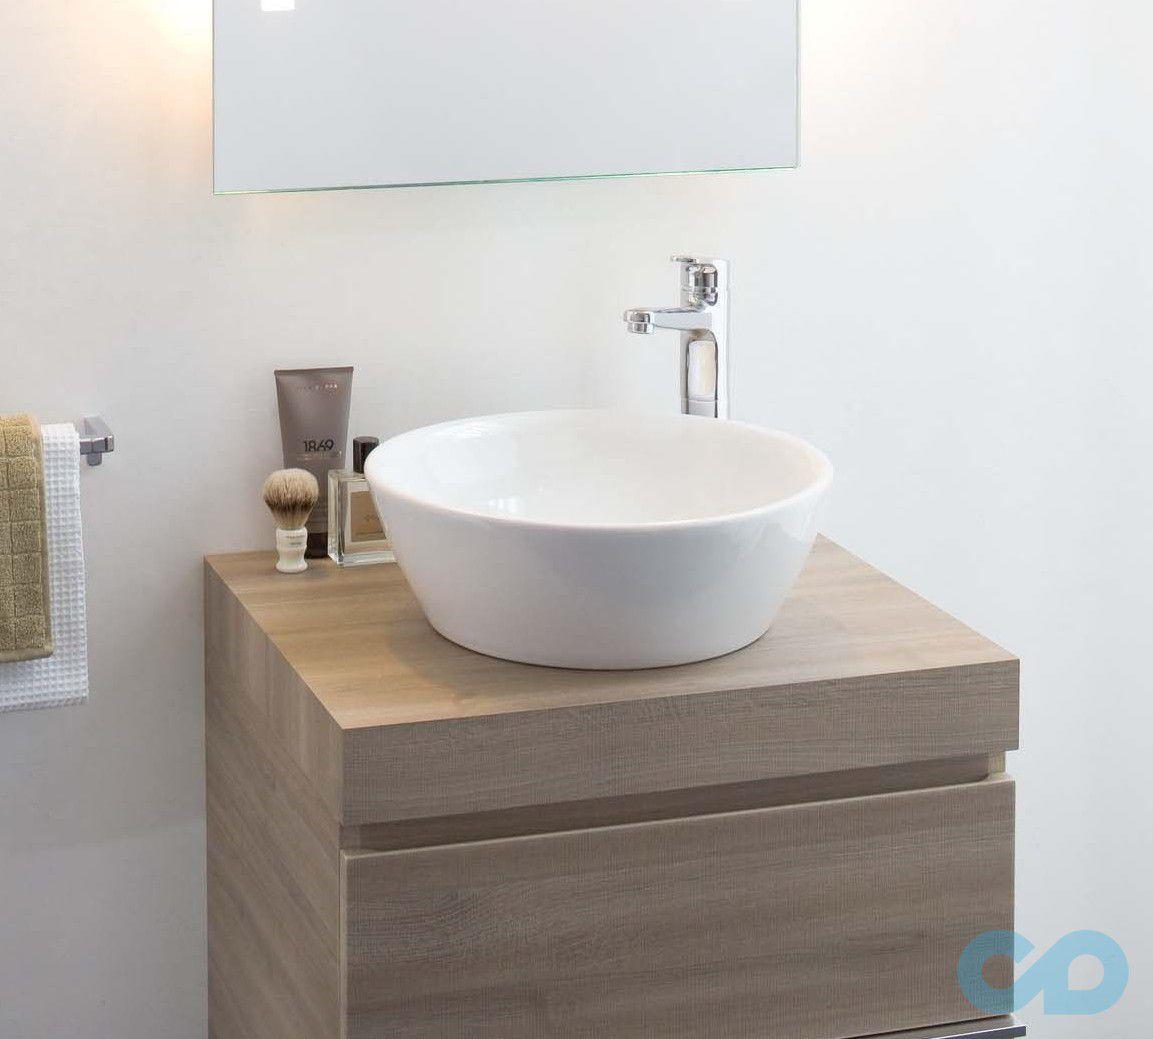 laufen pro b 812962 5534. Black Bedroom Furniture Sets. Home Design Ideas